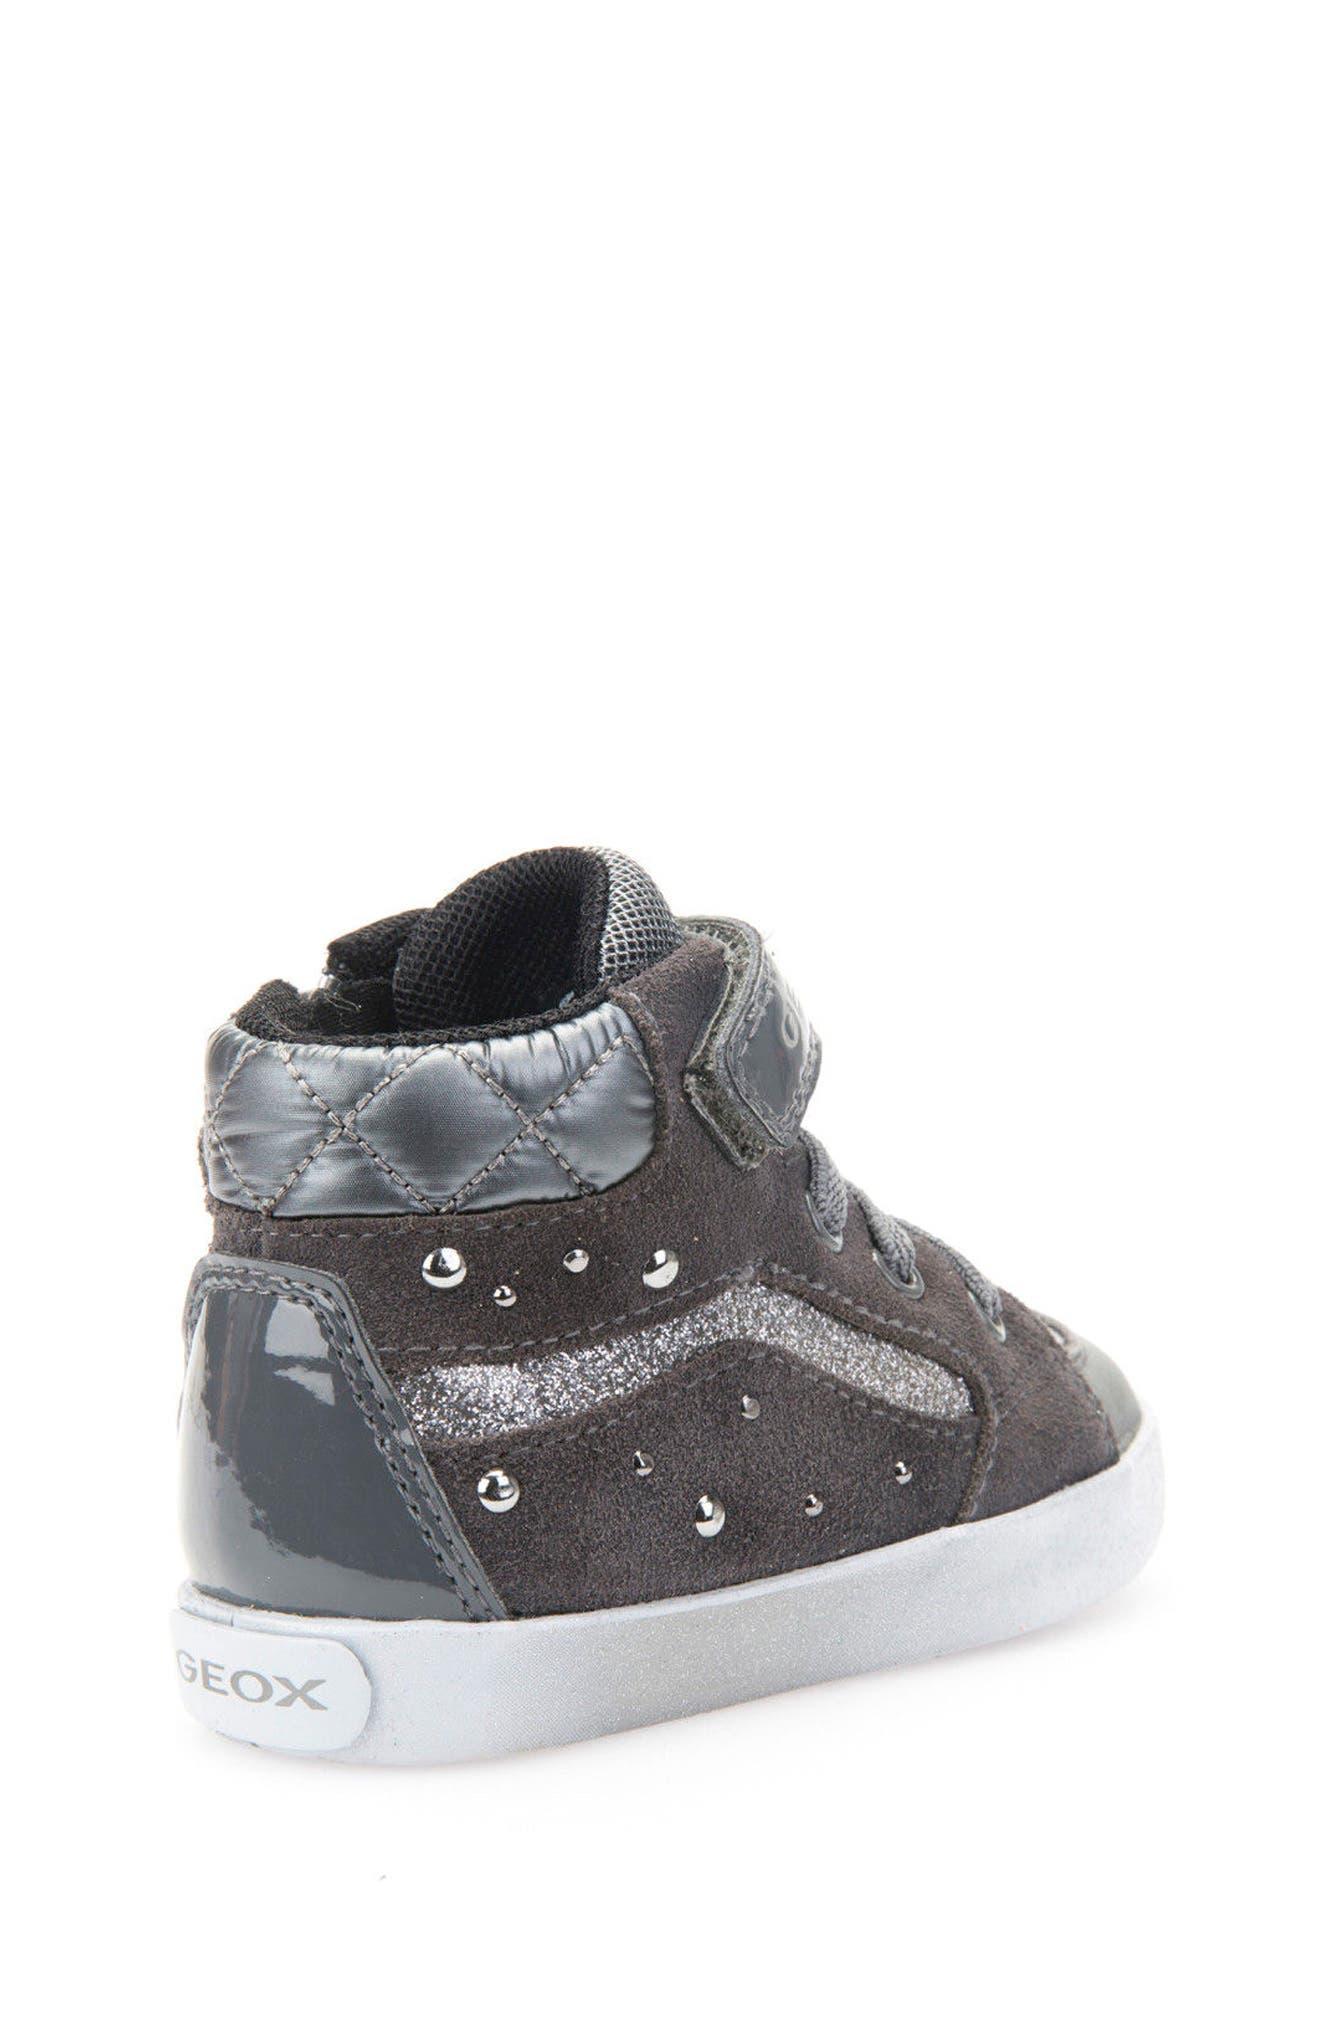 Kiwi Studded High Top Sneaker,                             Alternate thumbnail 7, color,                             020